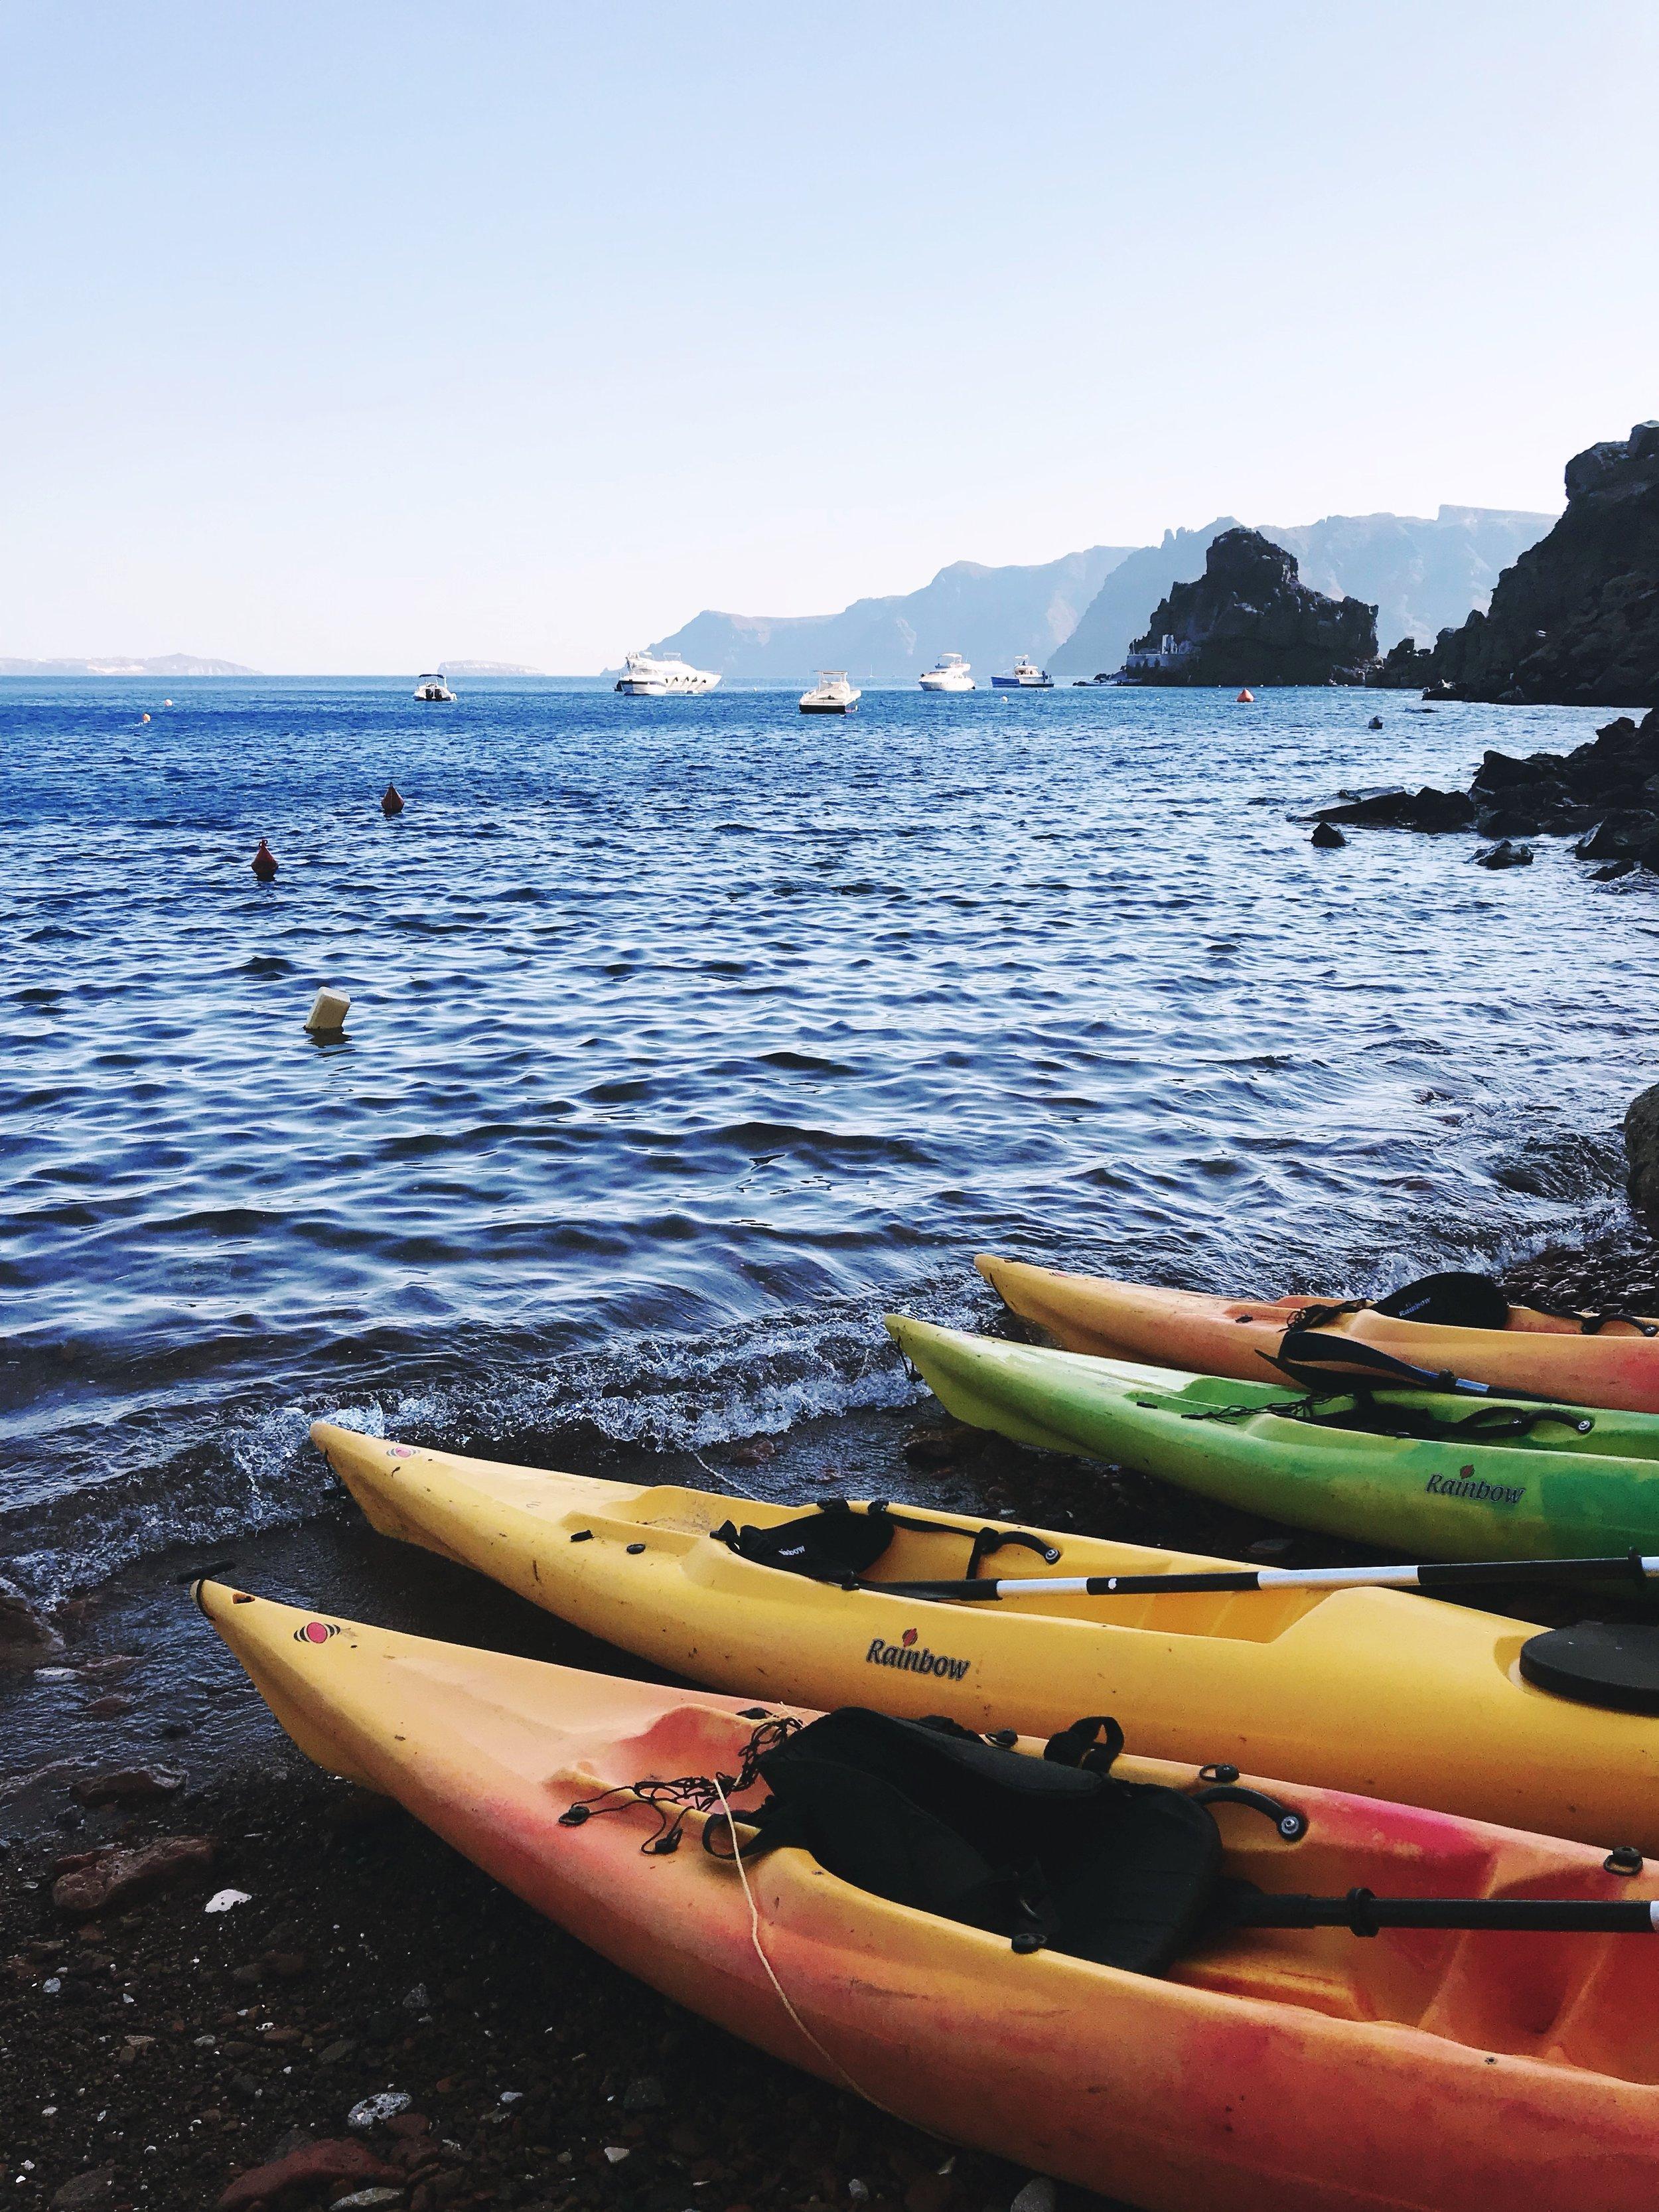 Kayaking in the Mediterranean